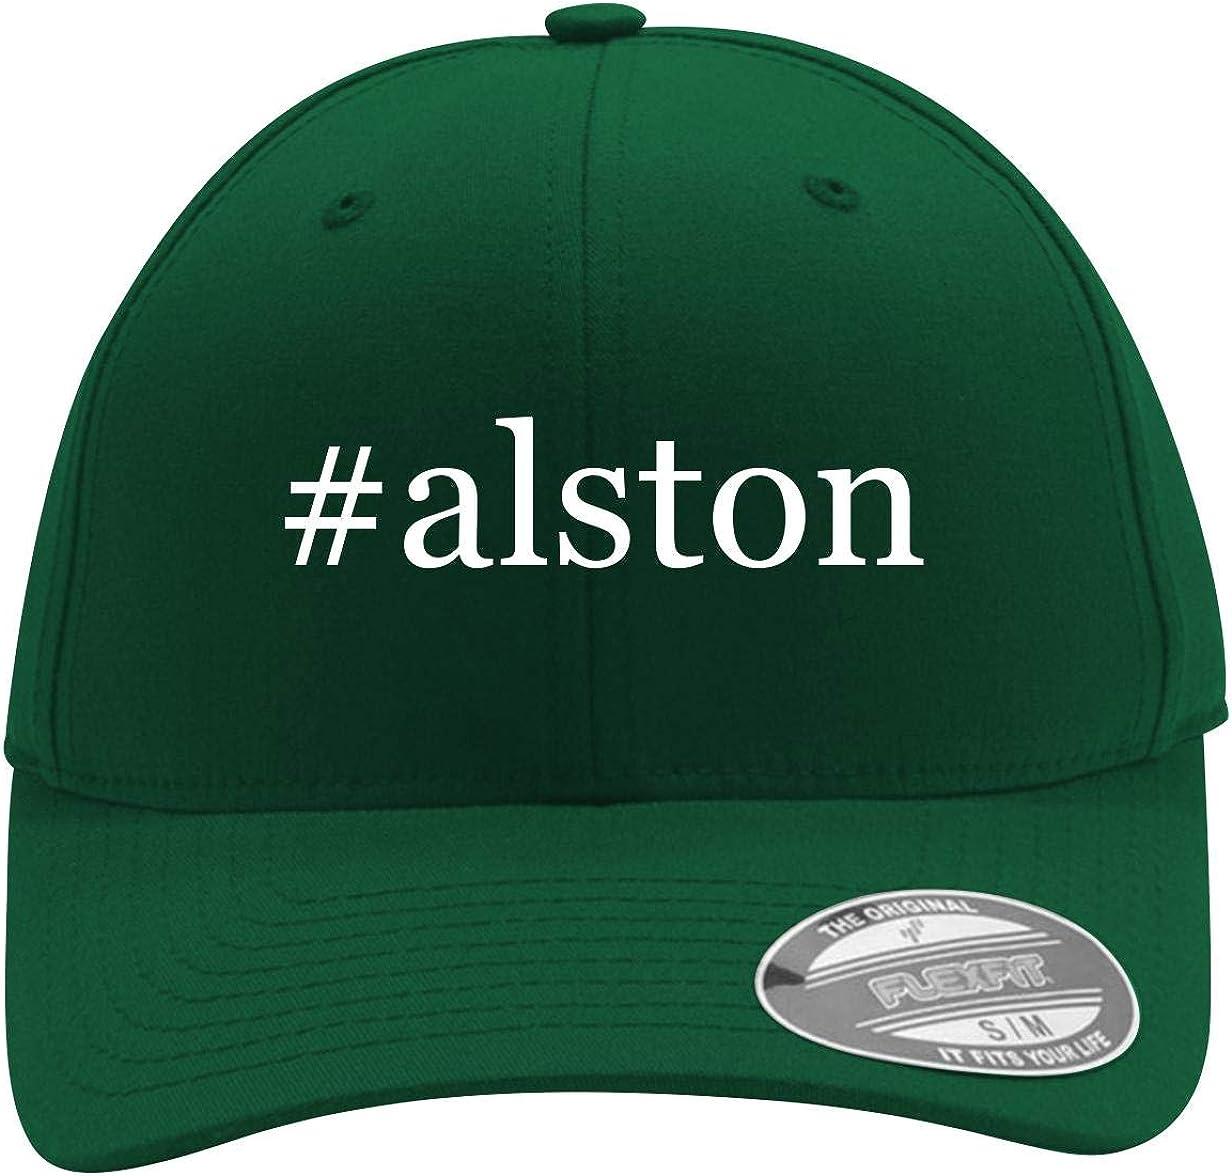 #Alston - Men'S Hashtag Flexfit Baseball Cap Hat